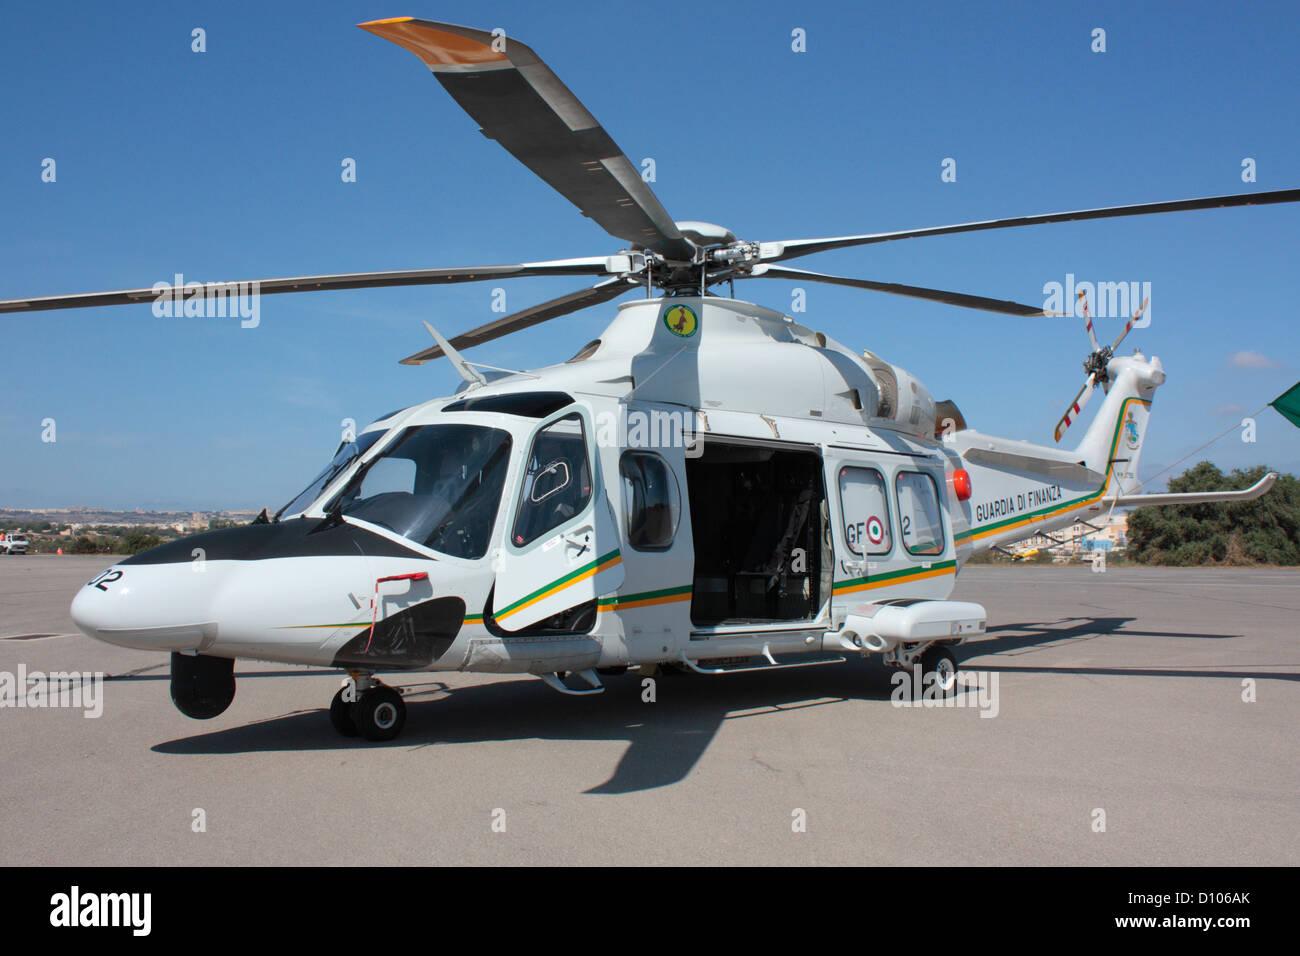 Hélicoptère AgustaWestland AW139 de la Guardia di Finanza ou service des douanes Photo Stock